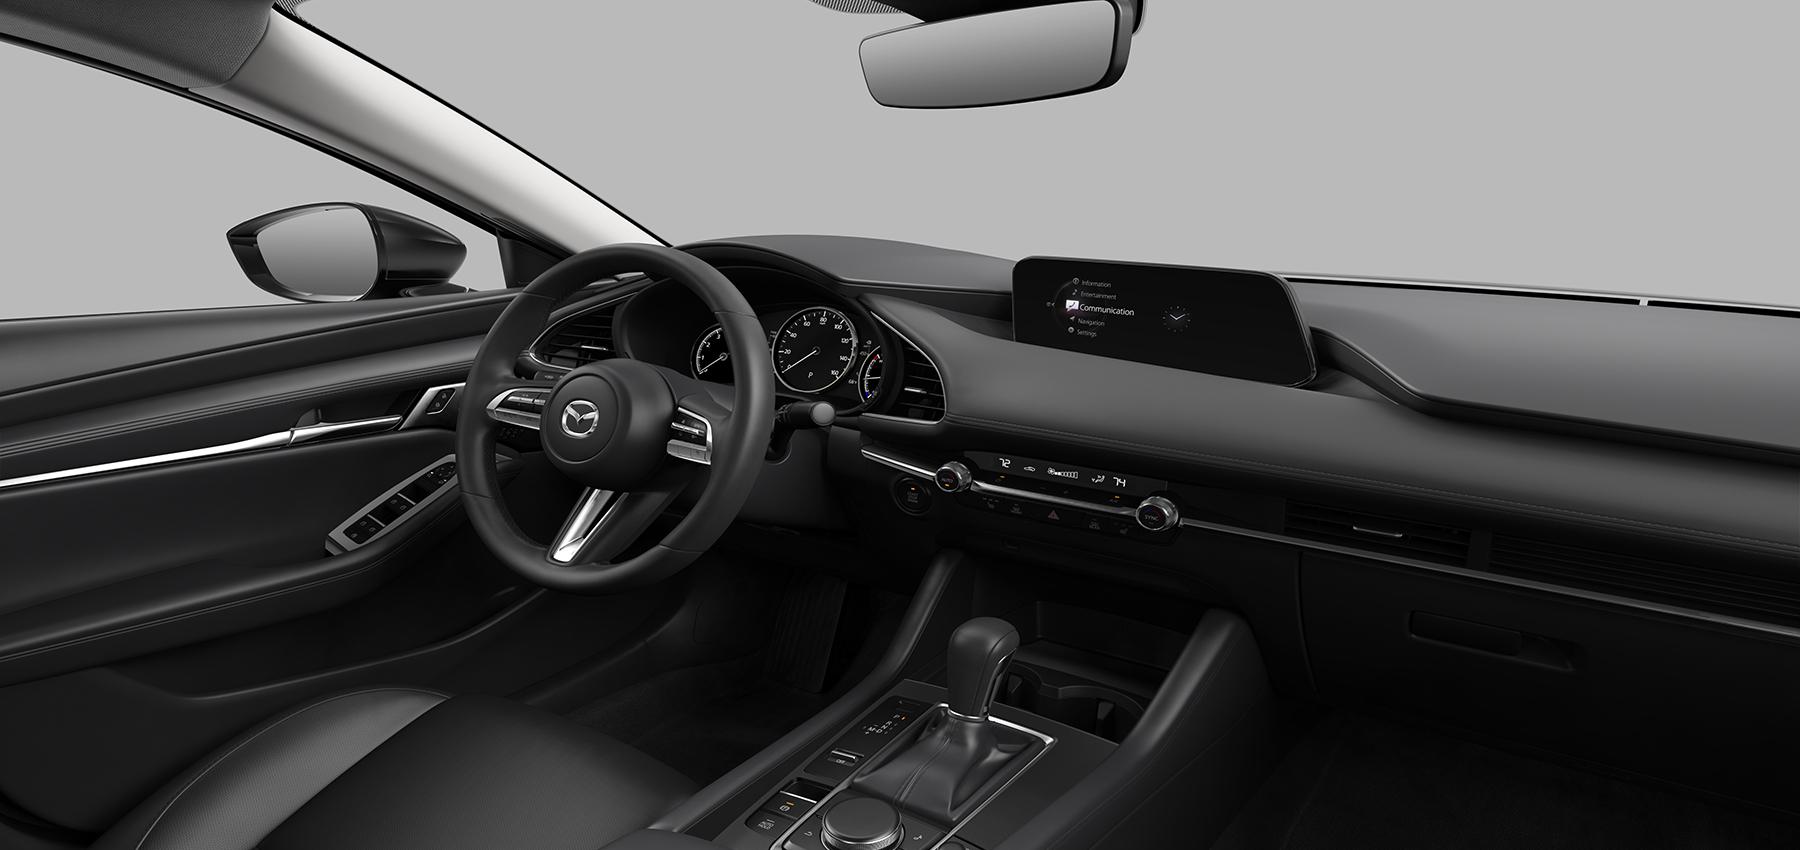 New 2021 Mazda3 Premium